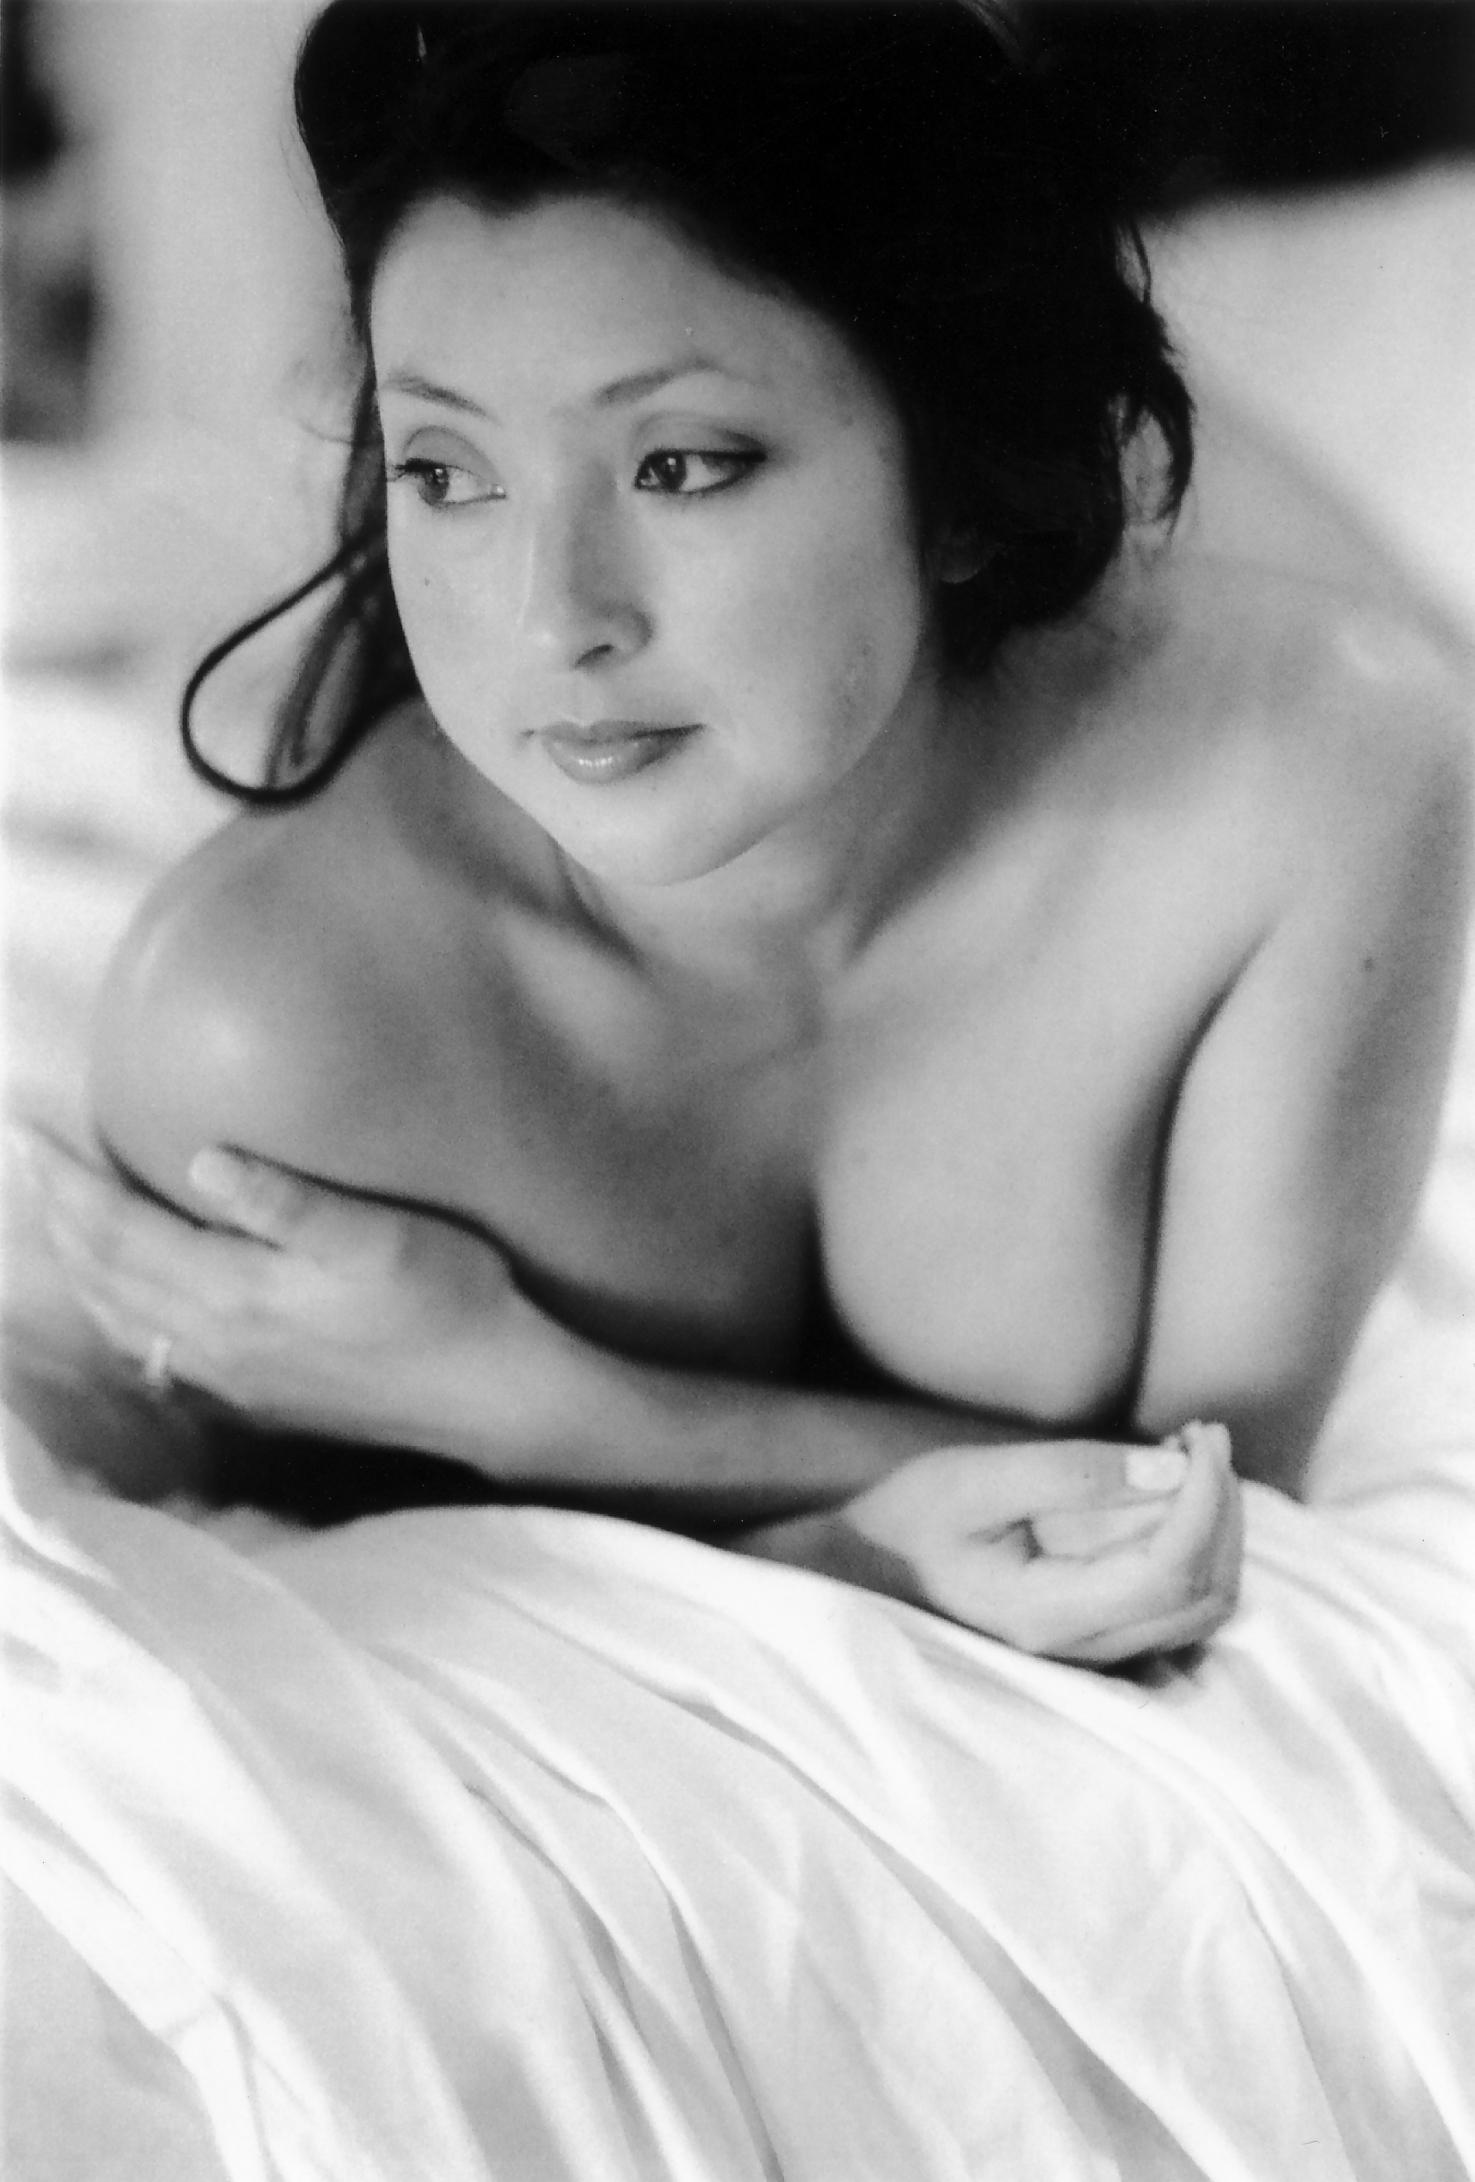 intimate-26.jpg